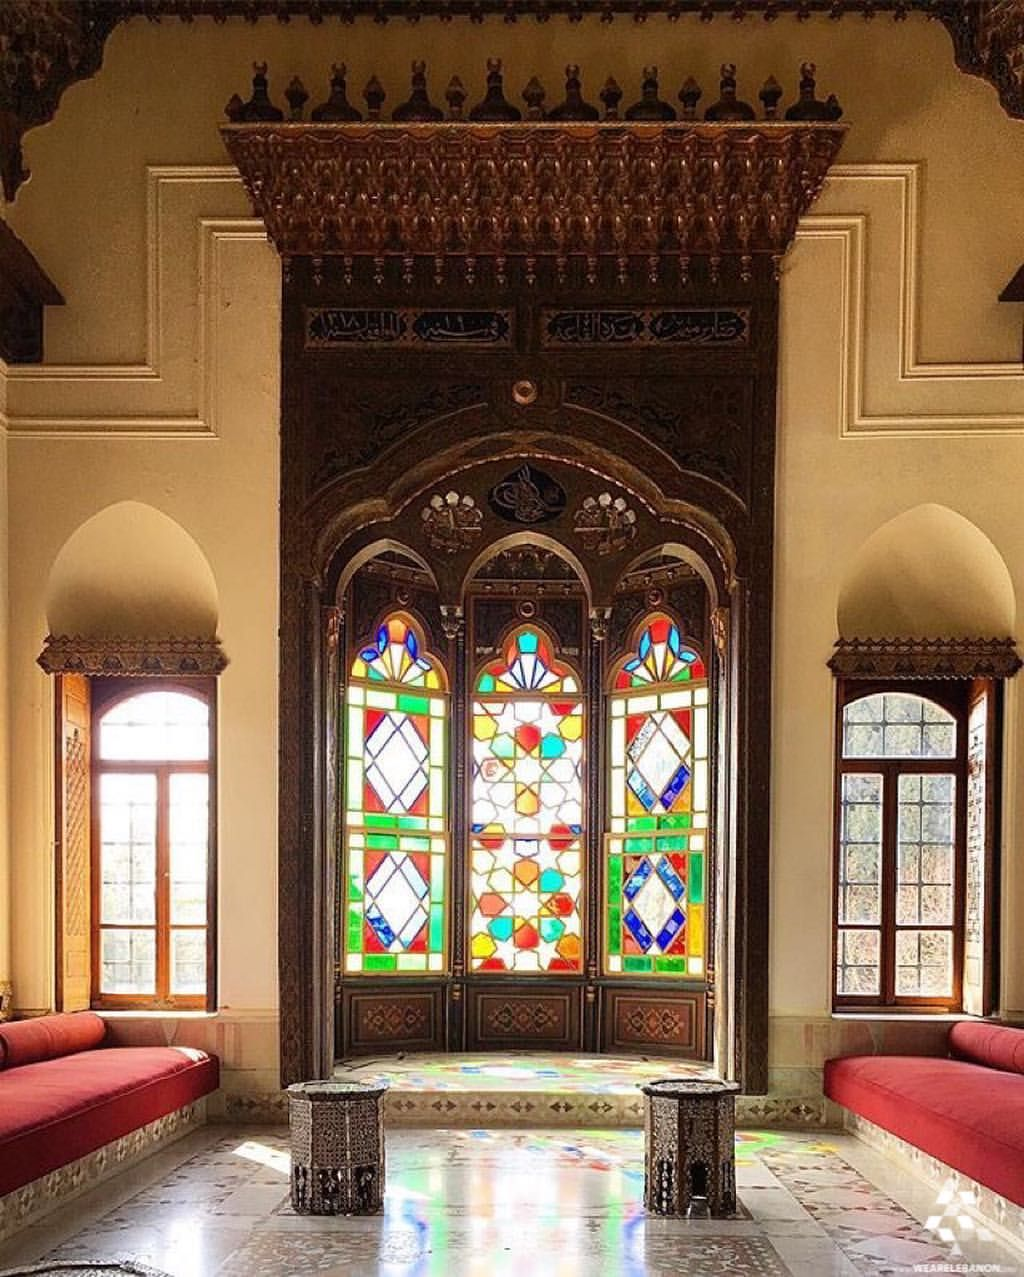 Beiteddine palace by fouxx beirut lebanonold citybeautiful architecturebeautiful also best lebanon images on pinterest and middle east rh